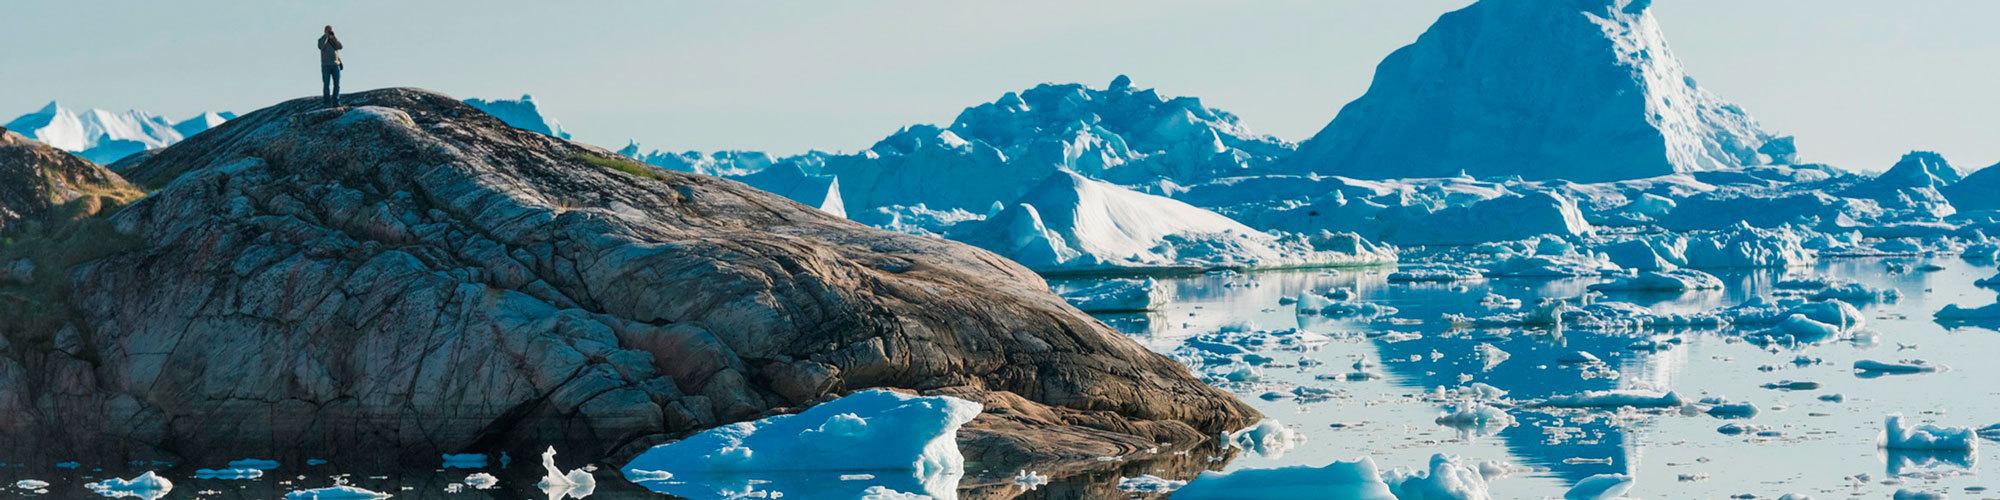 Groenland header